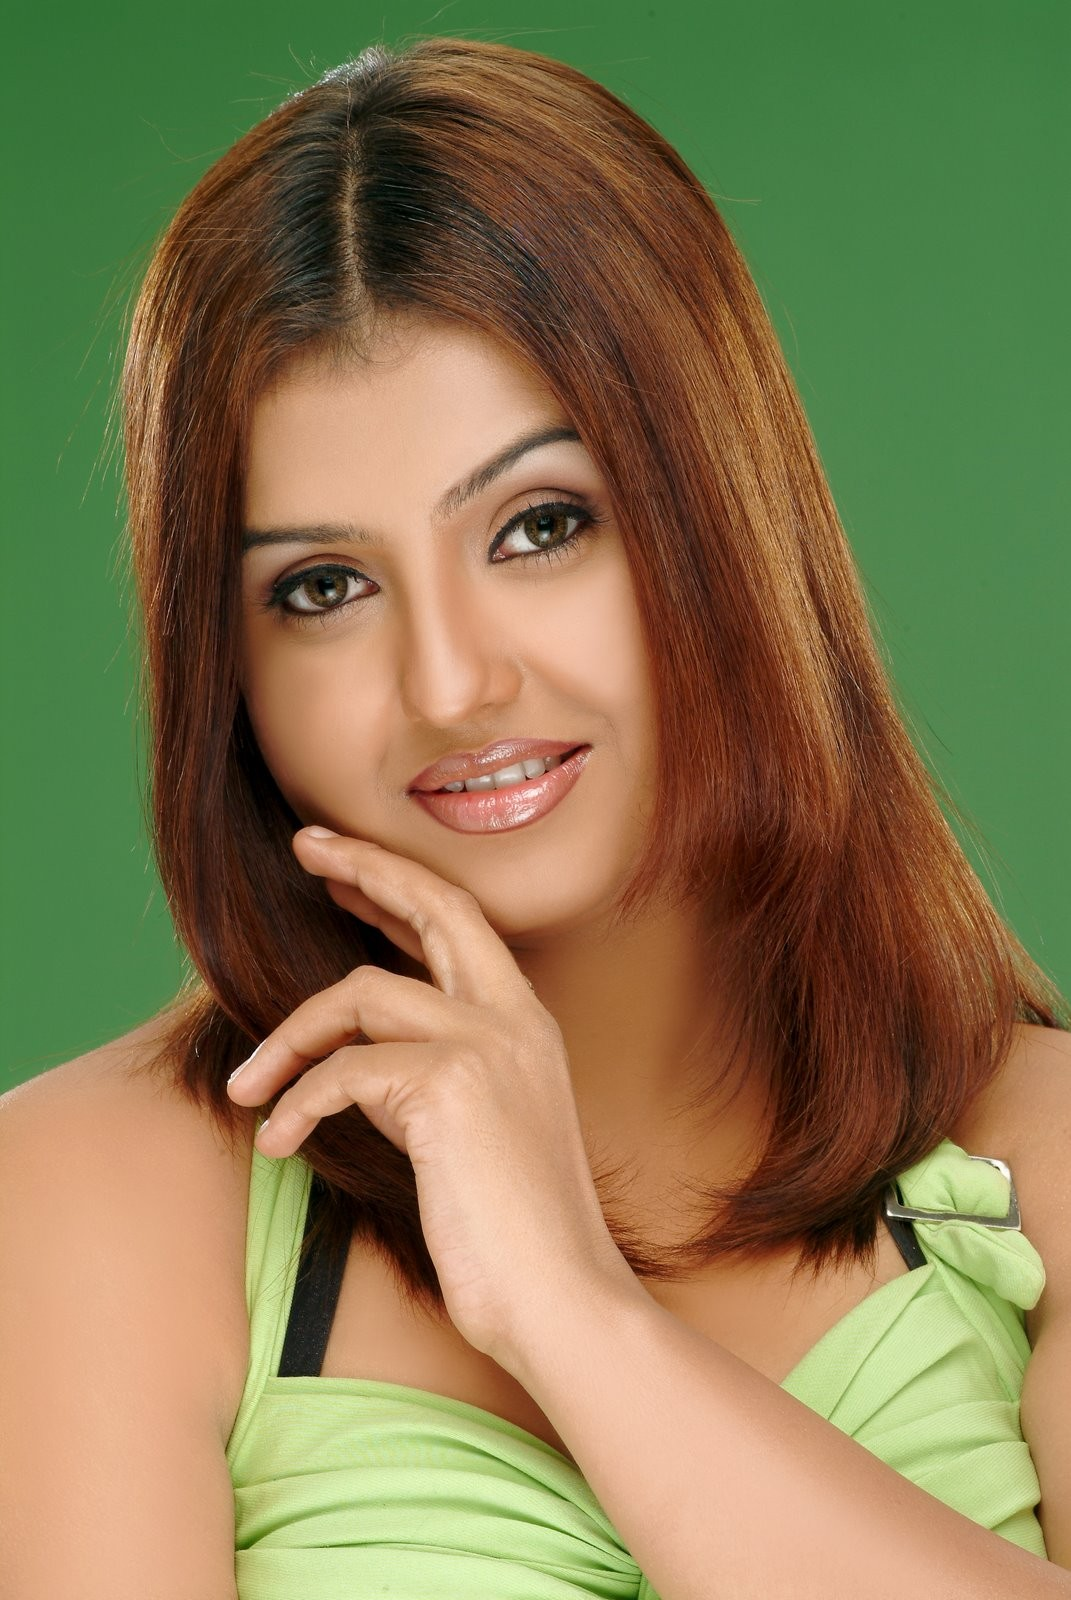 http://3.bp.blogspot.com/-TaGLcXxVewk/TmRkSZjoQGI/AAAAAAAAA1M/E6thmbu6yn0/s1600/Tamil_masala_Actress_Sona_Heiden_Photos_0056.jpg